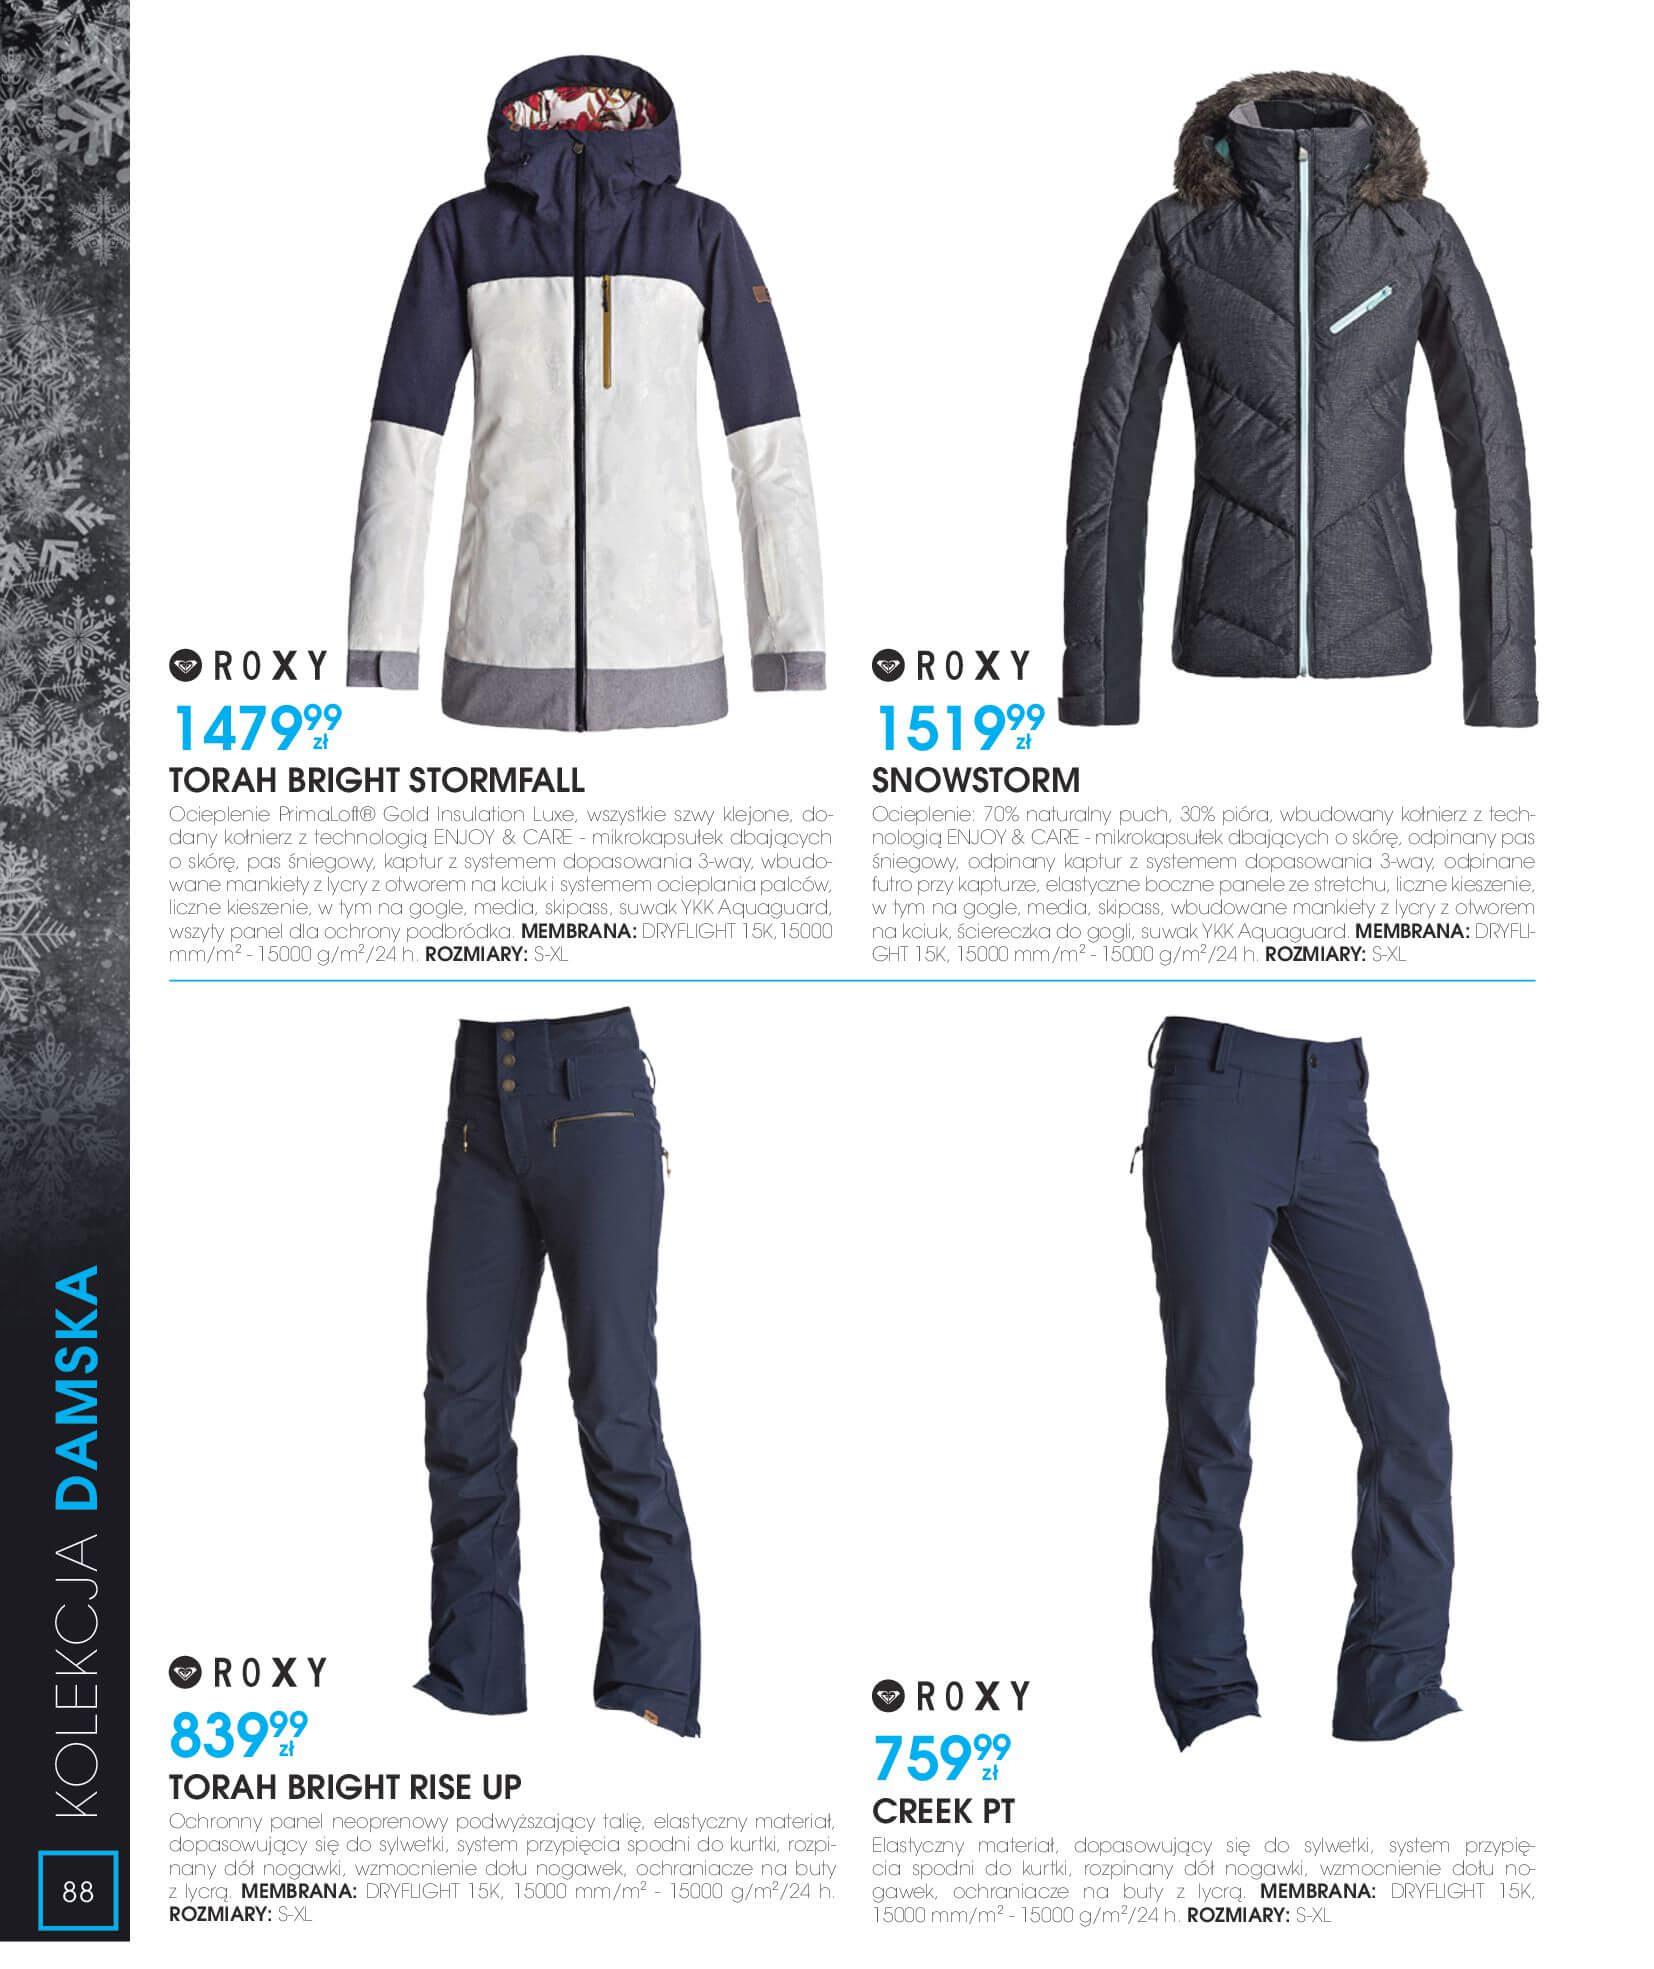 Gazetka Go Sport - Katalog Zima 2017/2018-12.11.2017-28.02.2018-page-88